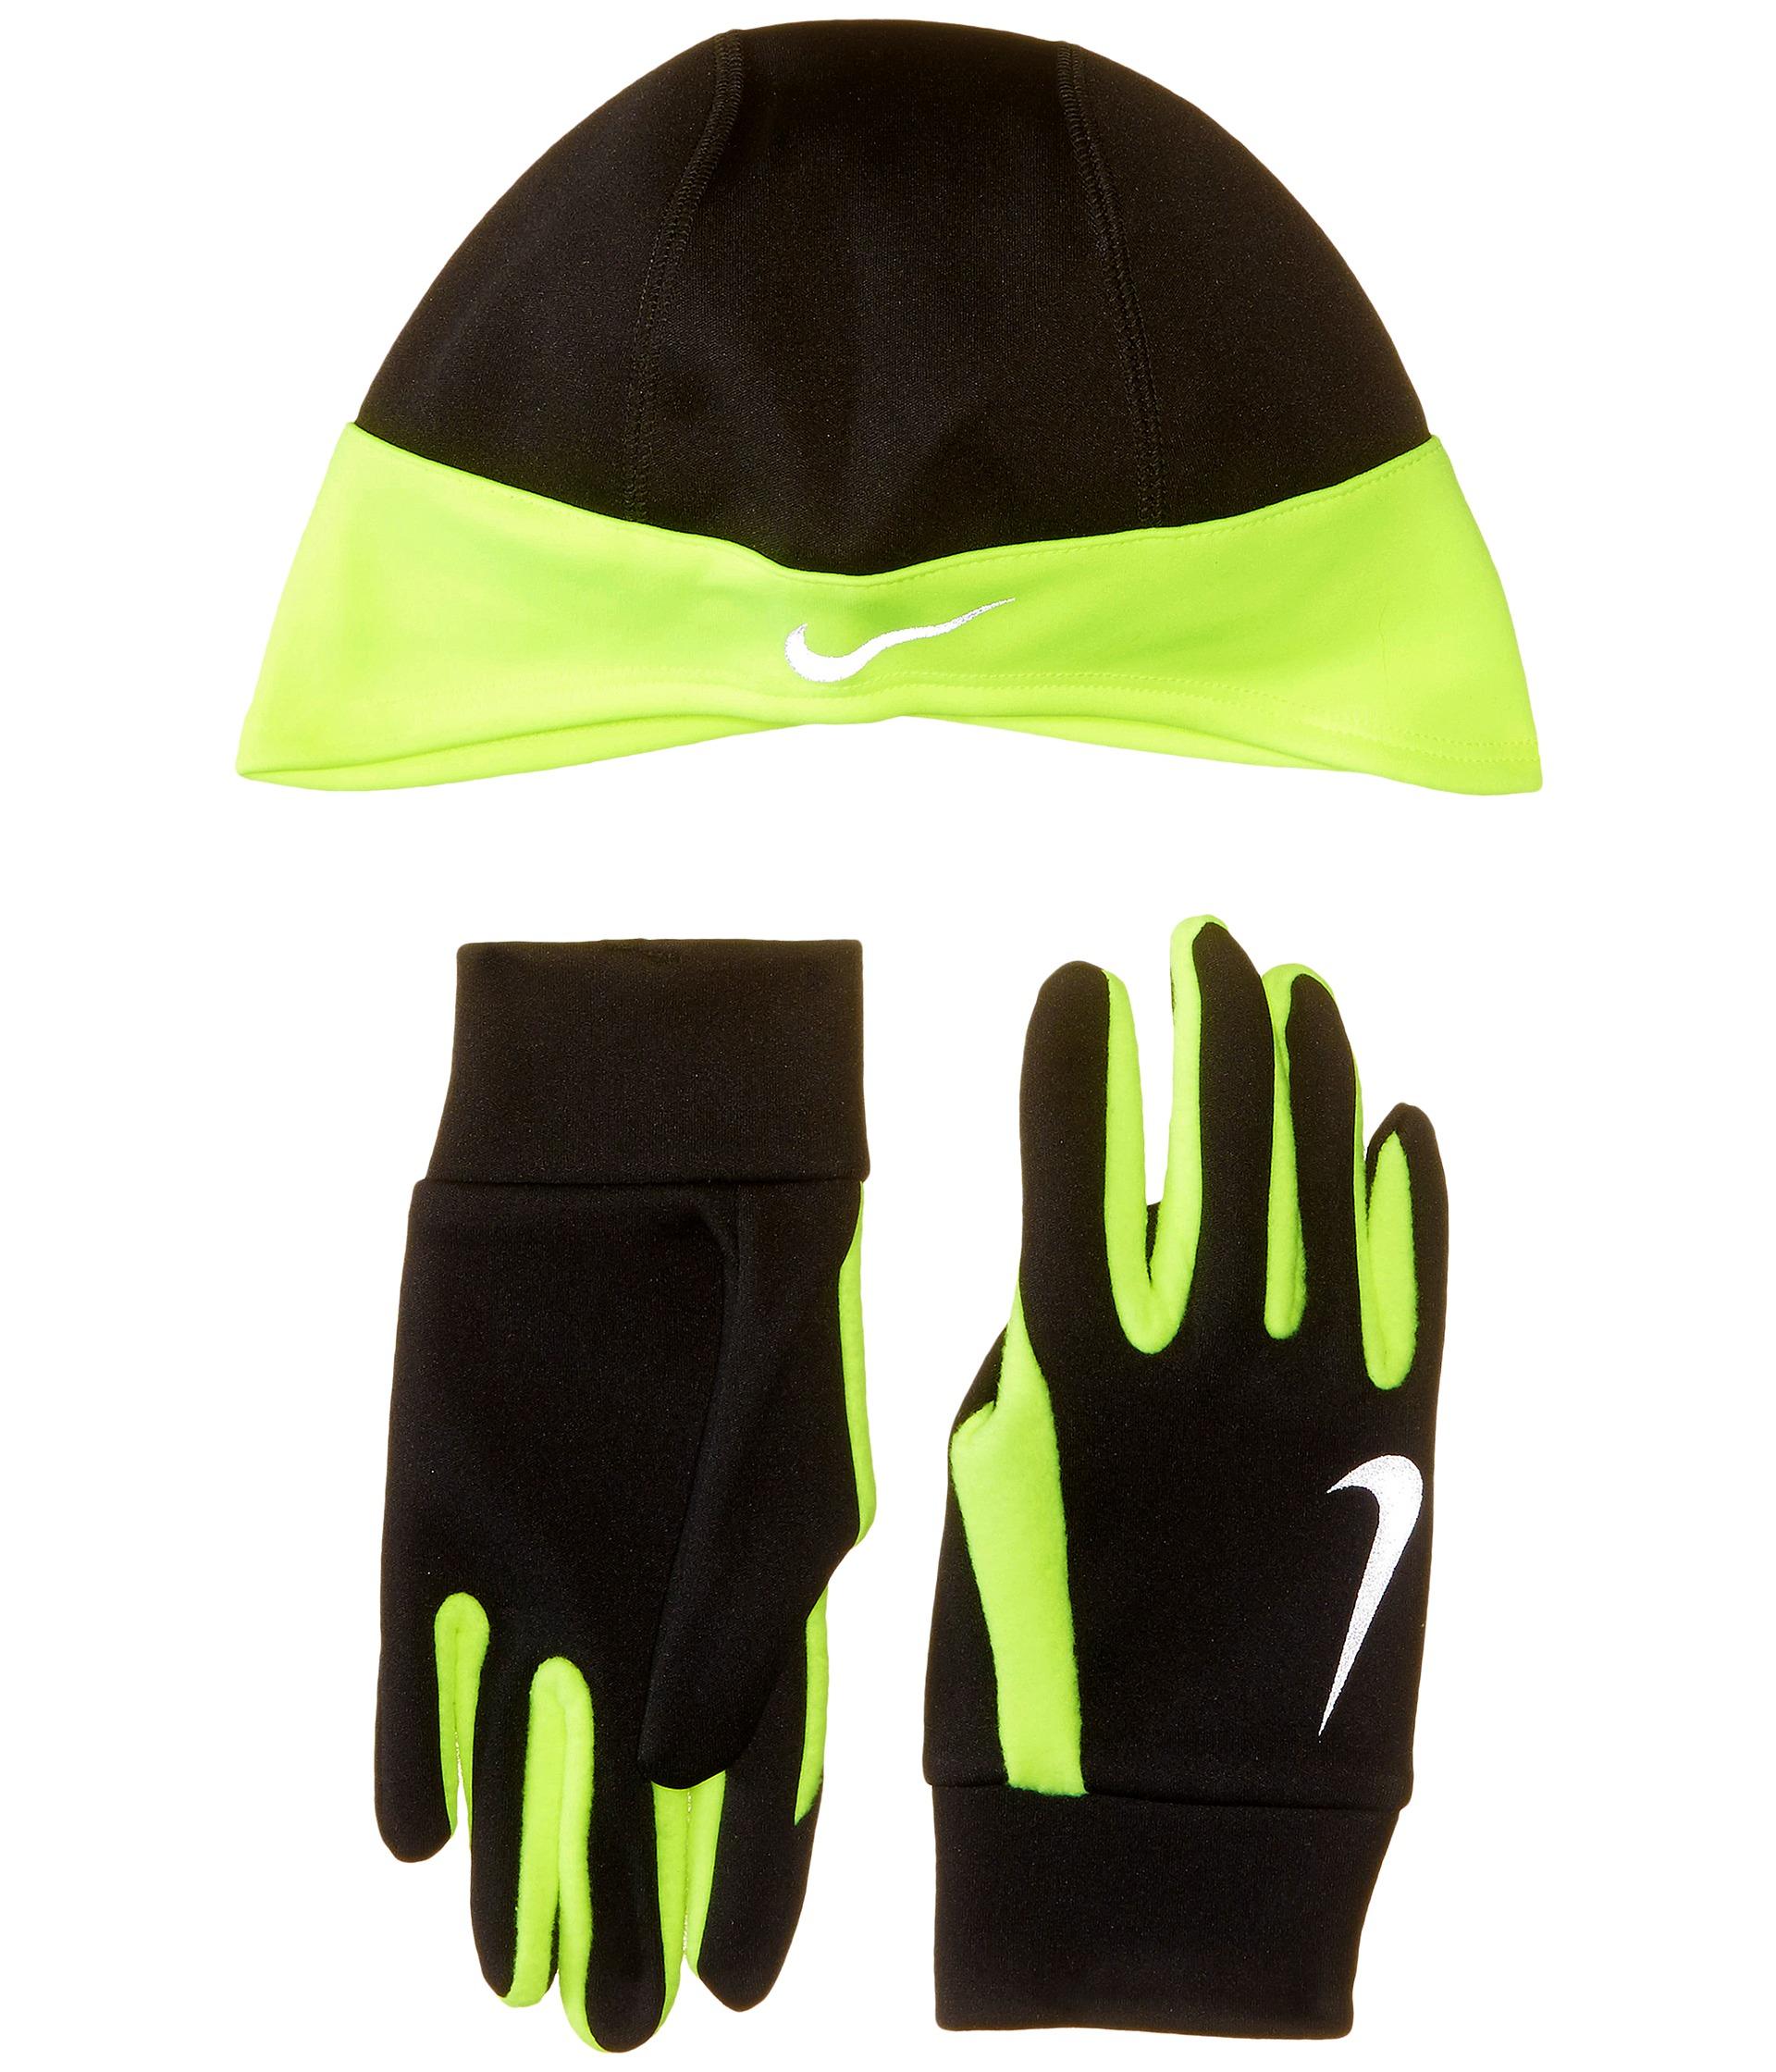 c9f194601bff Lyst - Nike Running Thermal Beanie glove Set in Black for Men